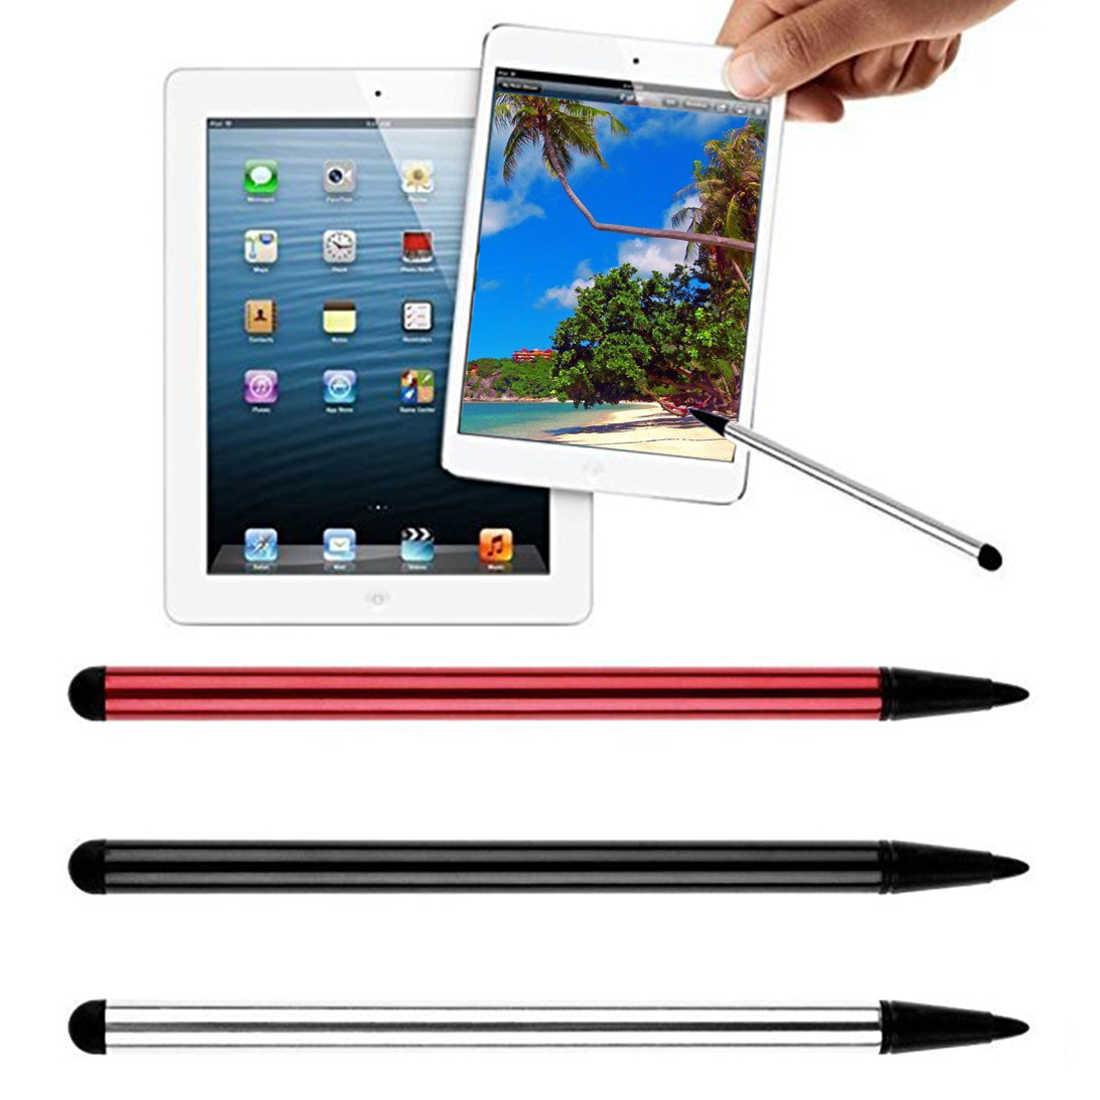 Stylus capacitivo tableta pluma pantalla táctil lápiz Universal Stylus para iPhone iPad para Samsung teléfono móvil tableta PC bolsillo PC